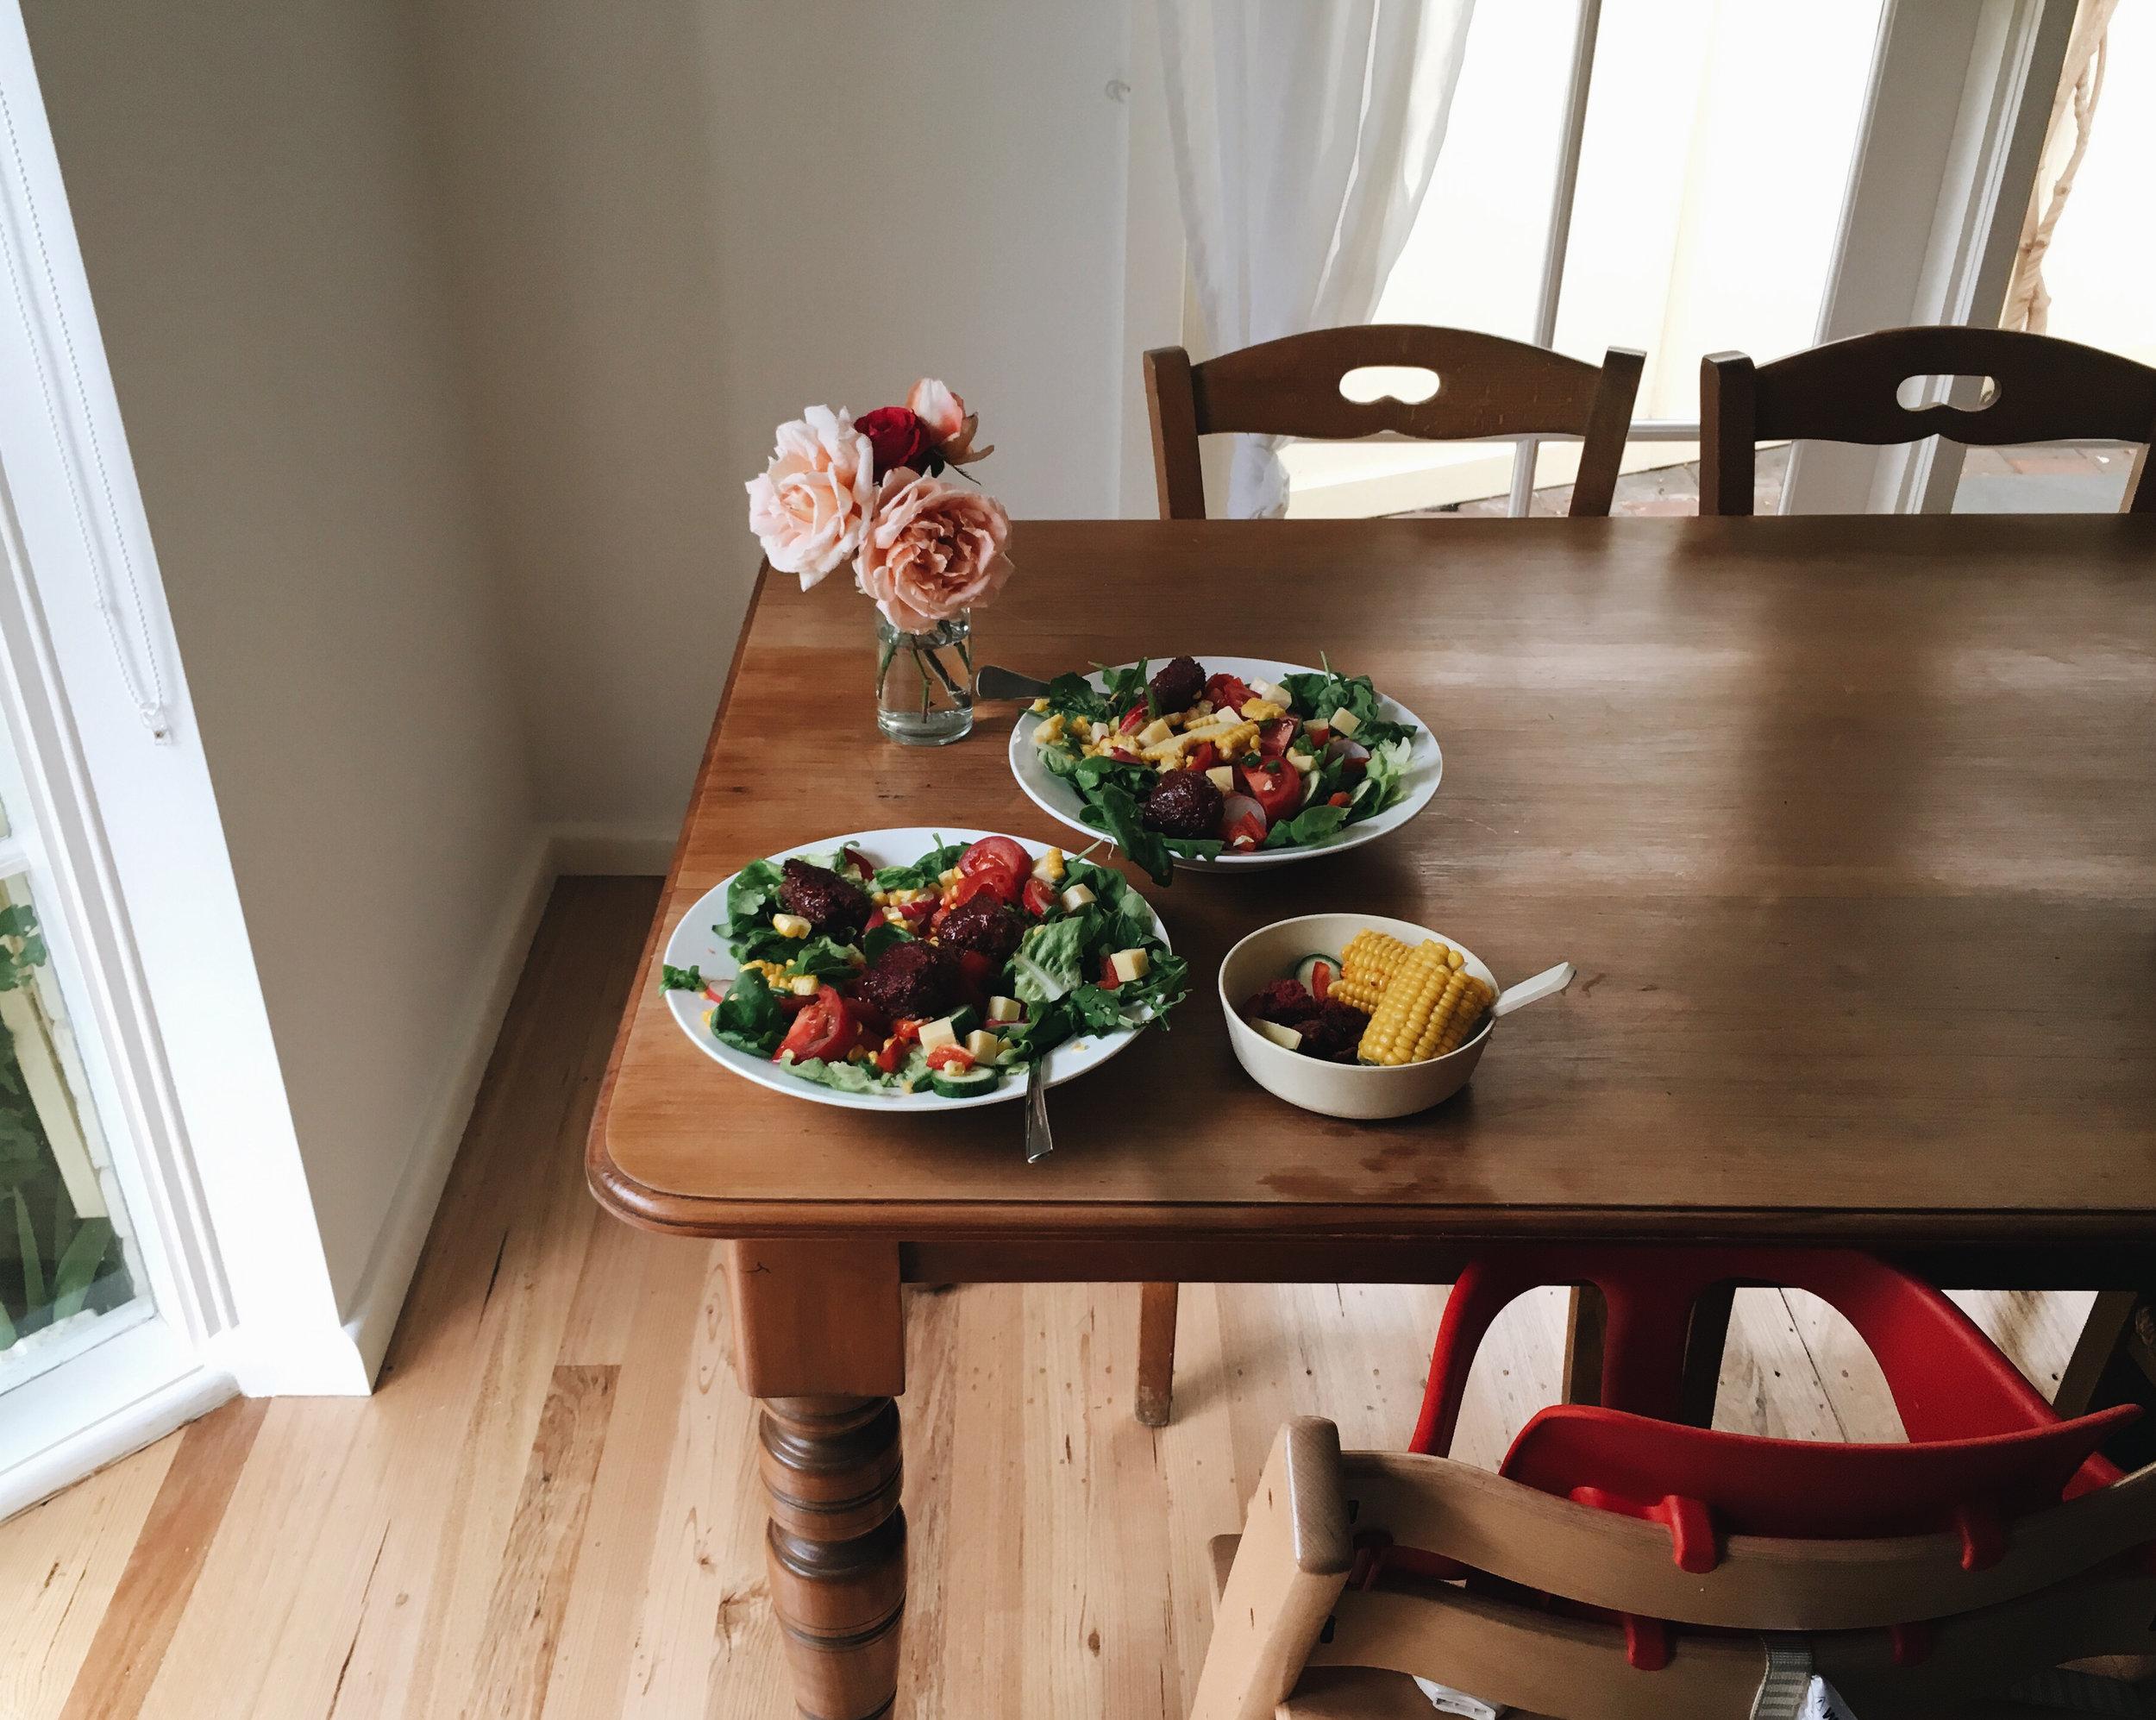 flowers-and-salad.jpg